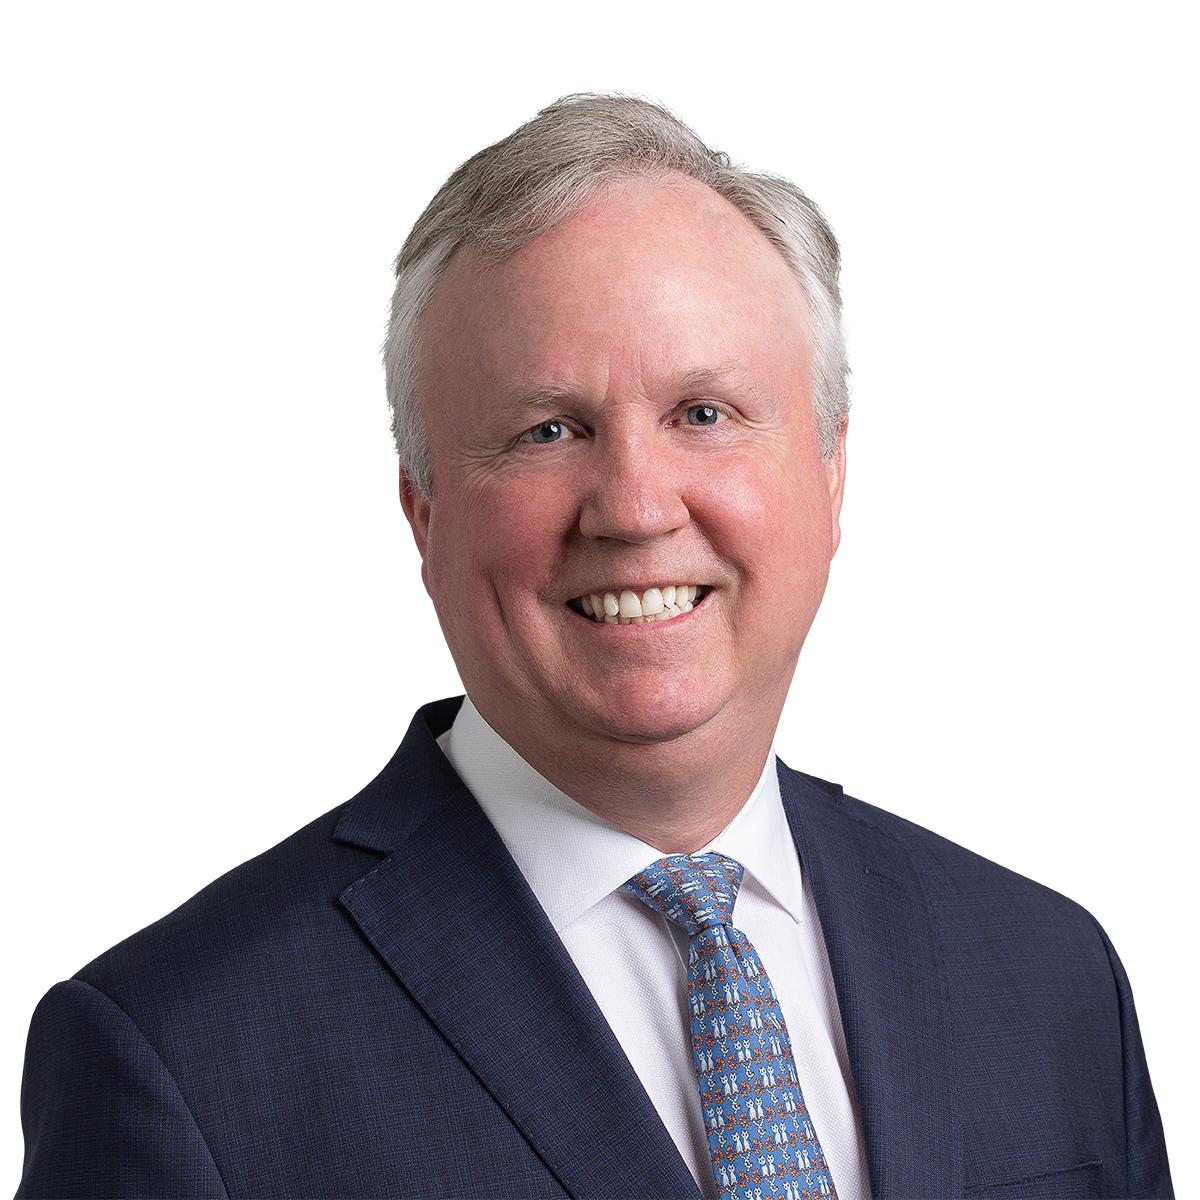 David Glen Banktech